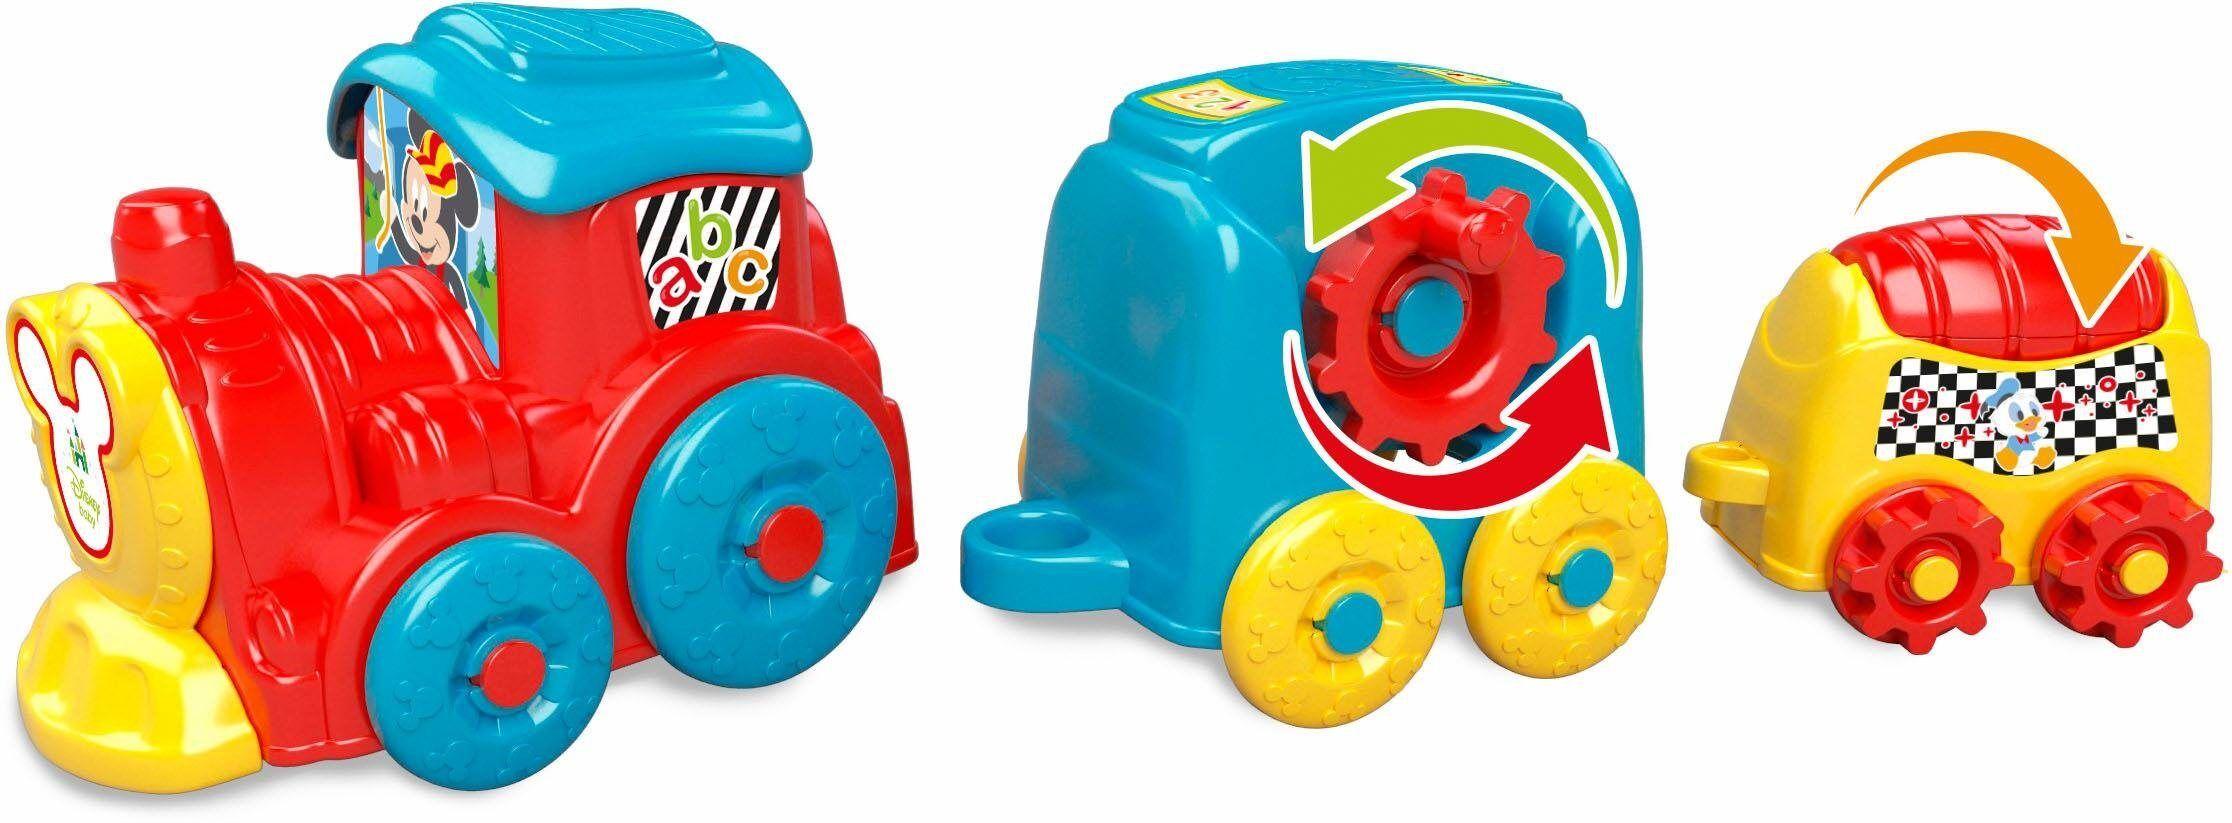 Clementoni® Spielzeug-Eisenbahn »Disney Baby, Stapelzug«, bunt